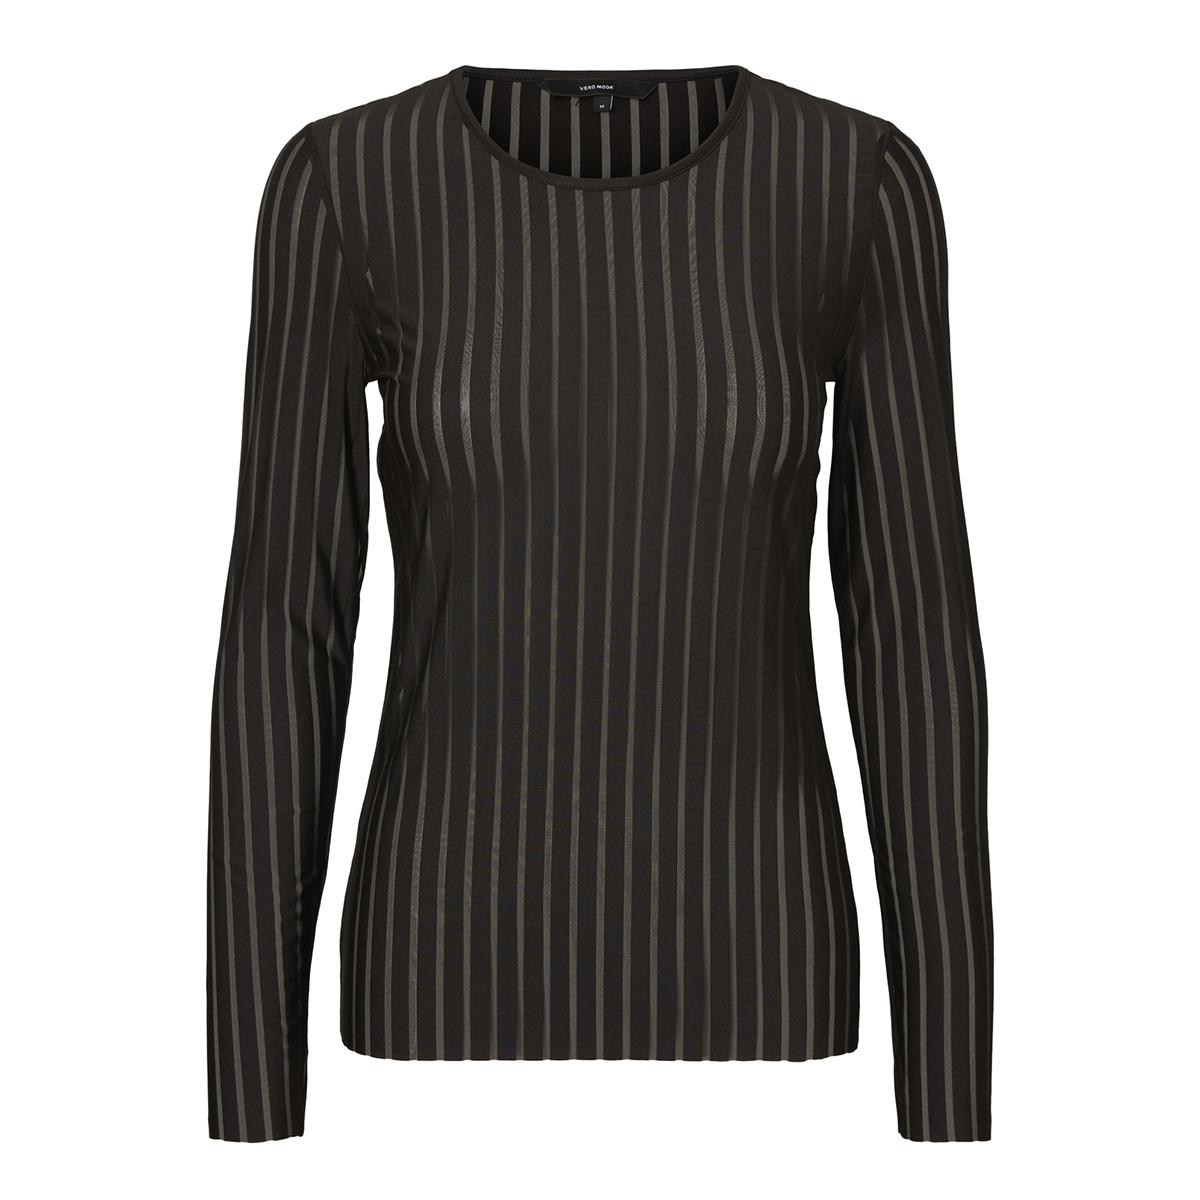 vmmoon mesh l/s o-neck top 10202106 vero moda t-shirt black/black